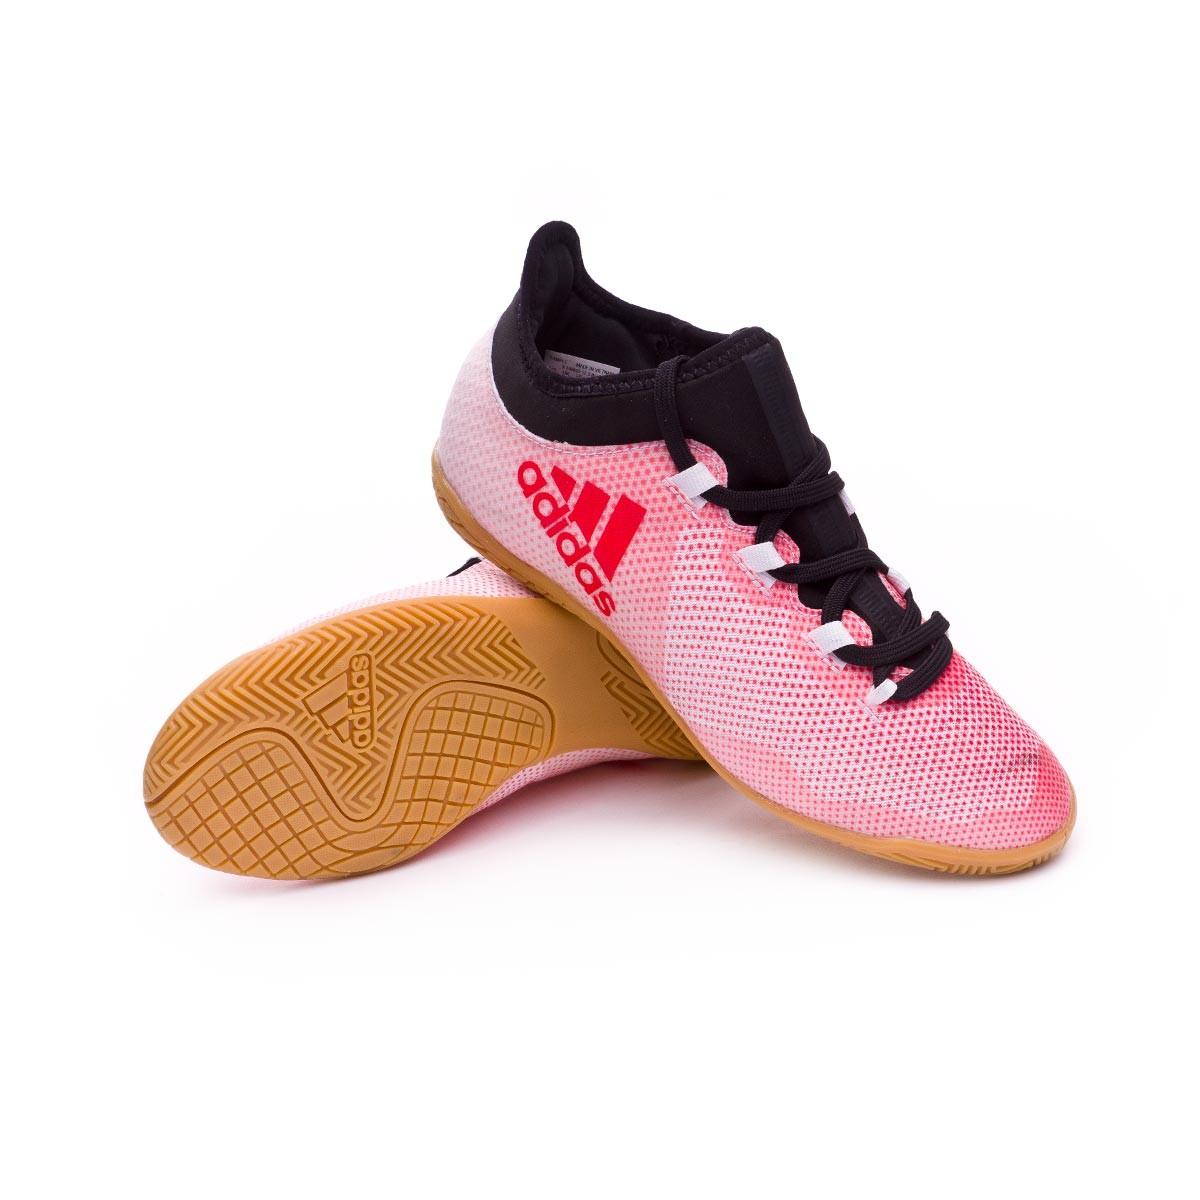 65a45c4537954 Chaussure de futsal adidas X Tango 17.3 IN enfant Grey-Real coral-Core  black - Boutique de football Fútbol Emotion